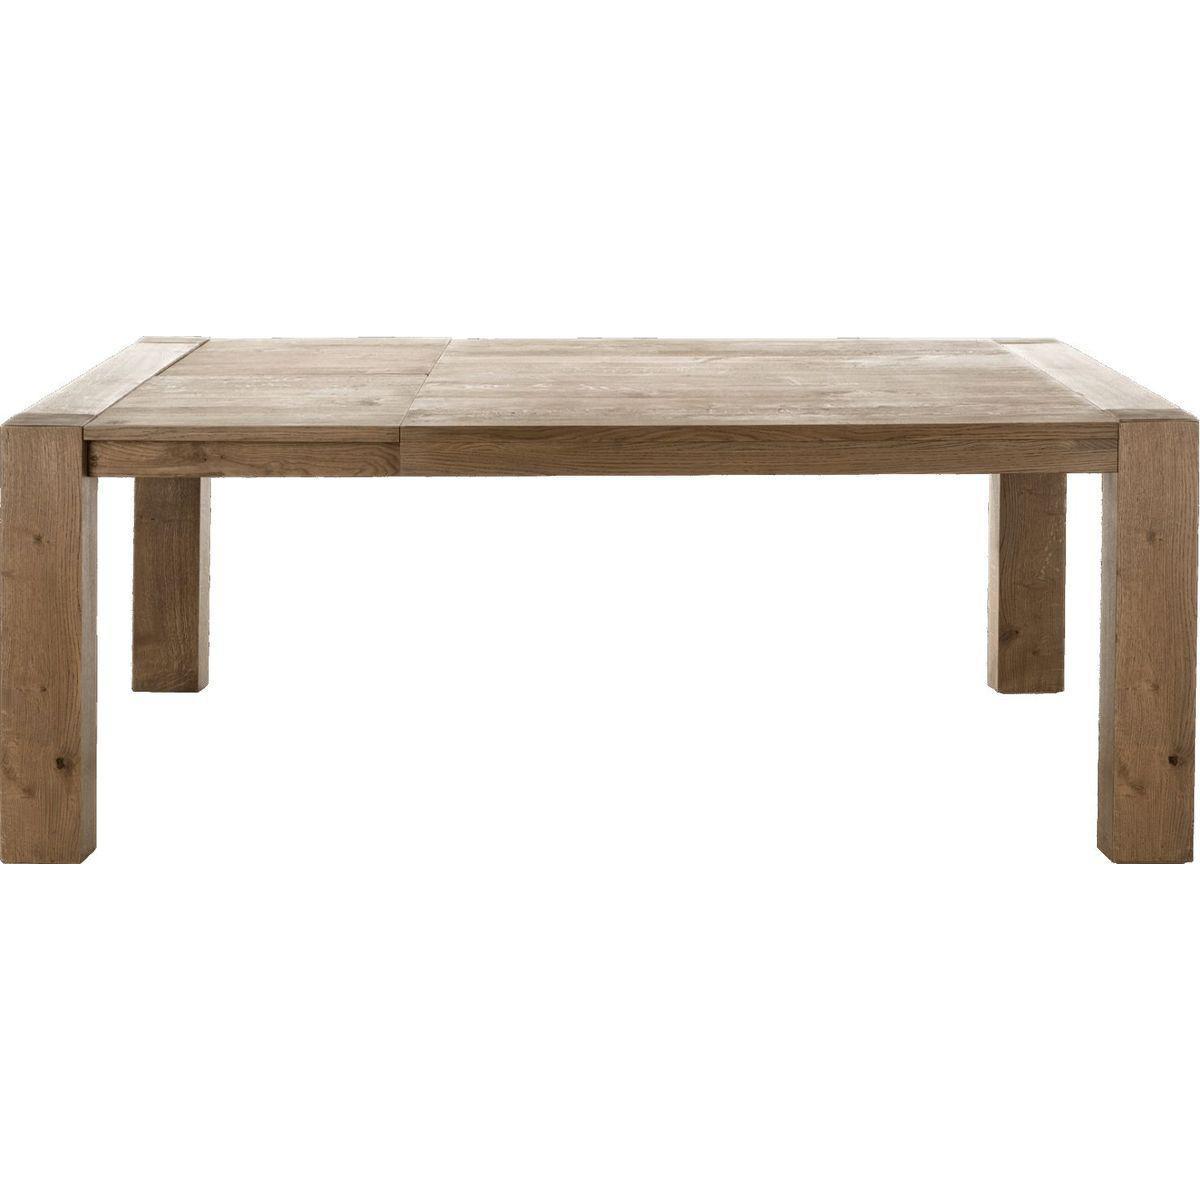 Table à rallonge 160-205cm SANTORINI Henders & Hazel castle sand